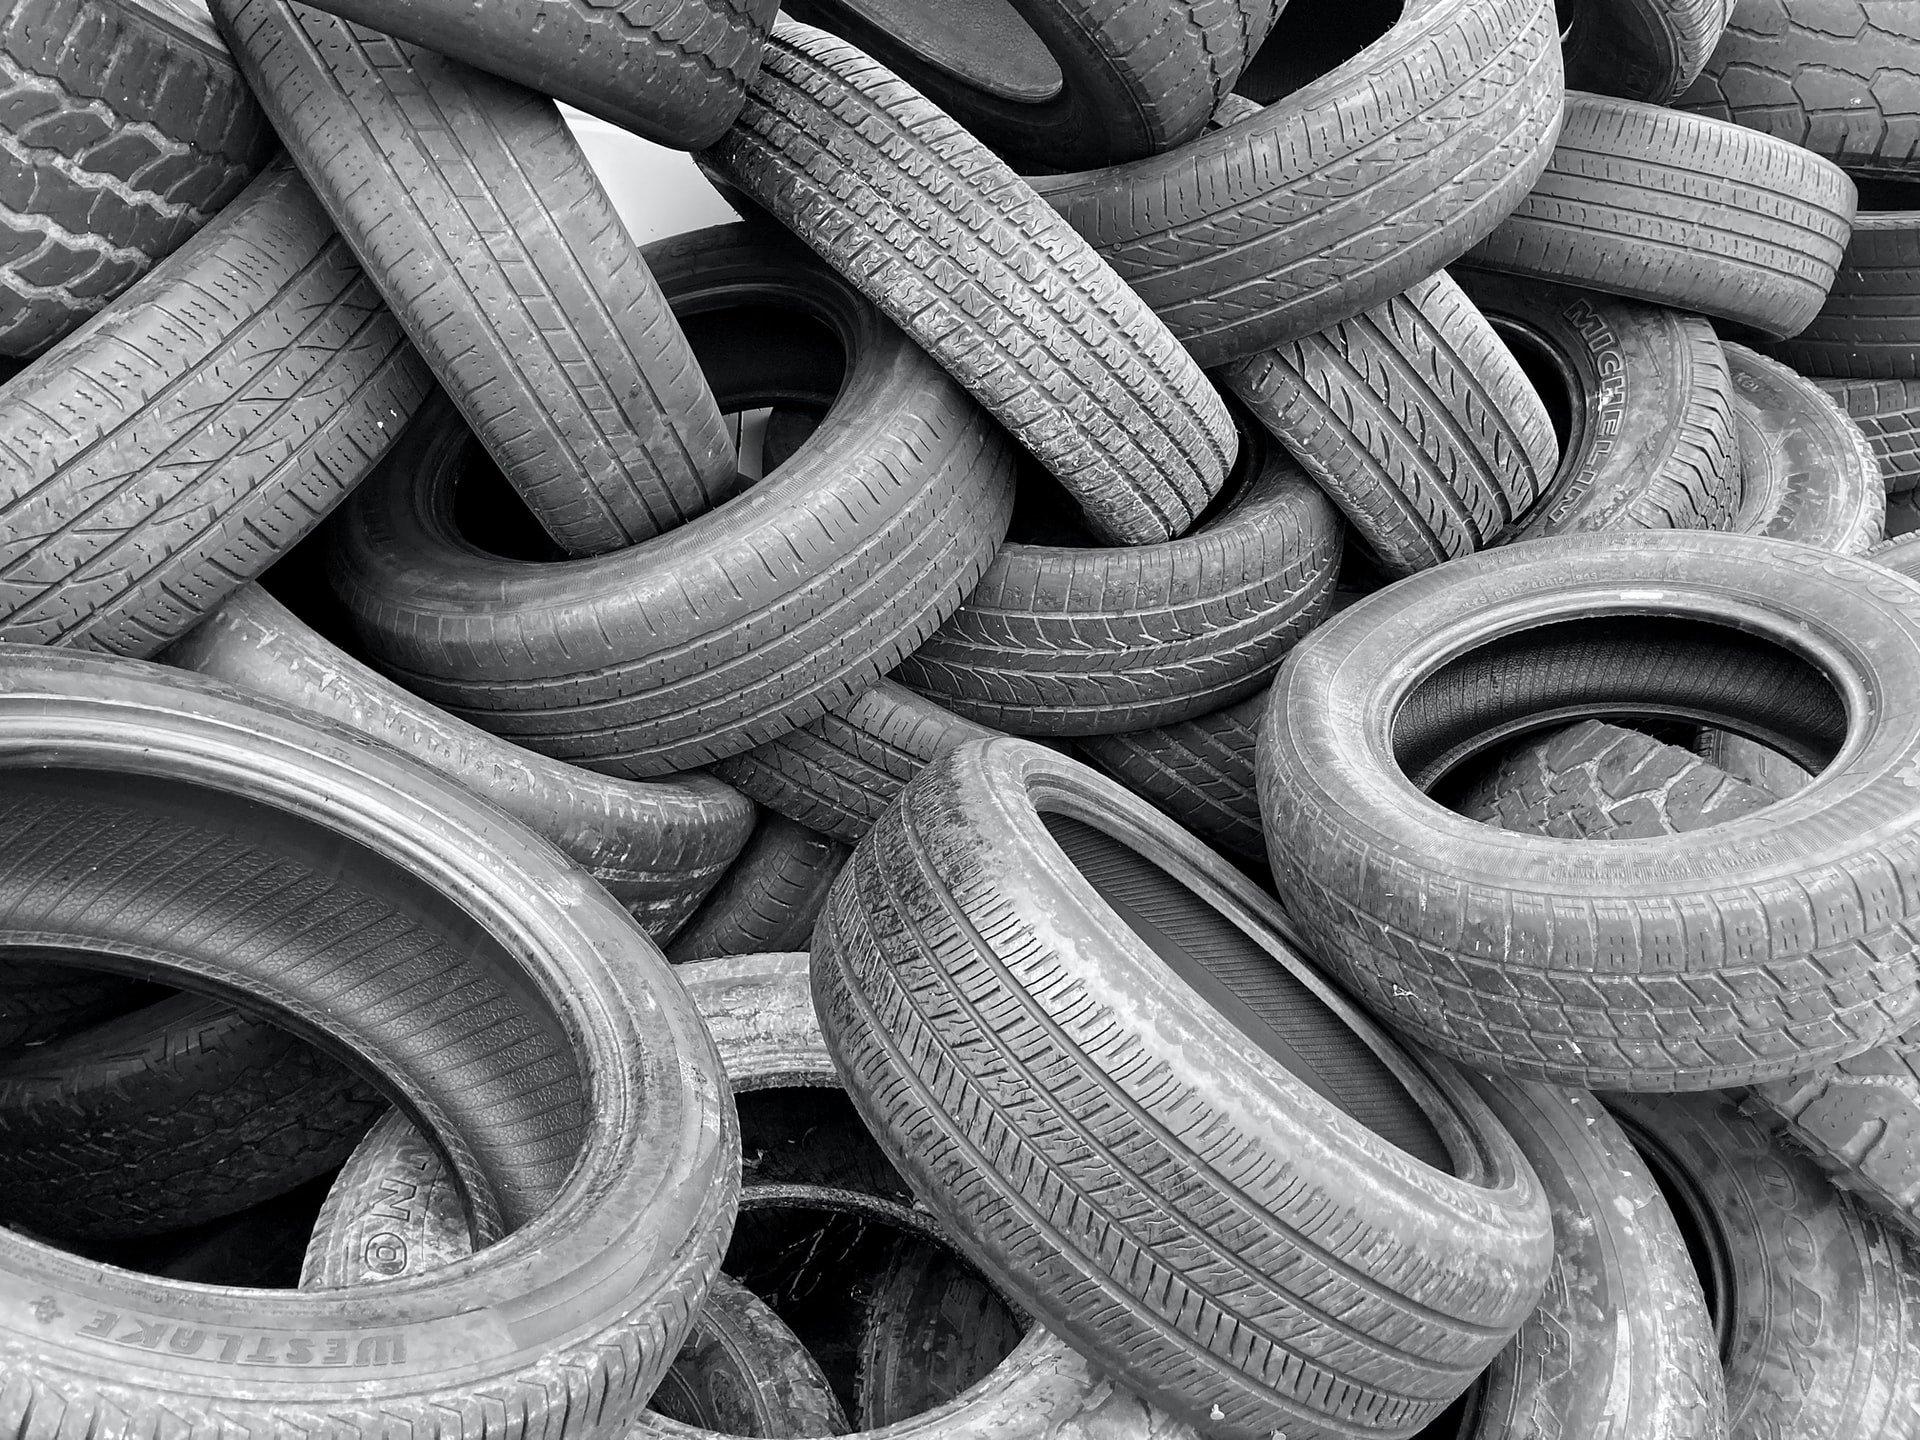 old car tires stored together